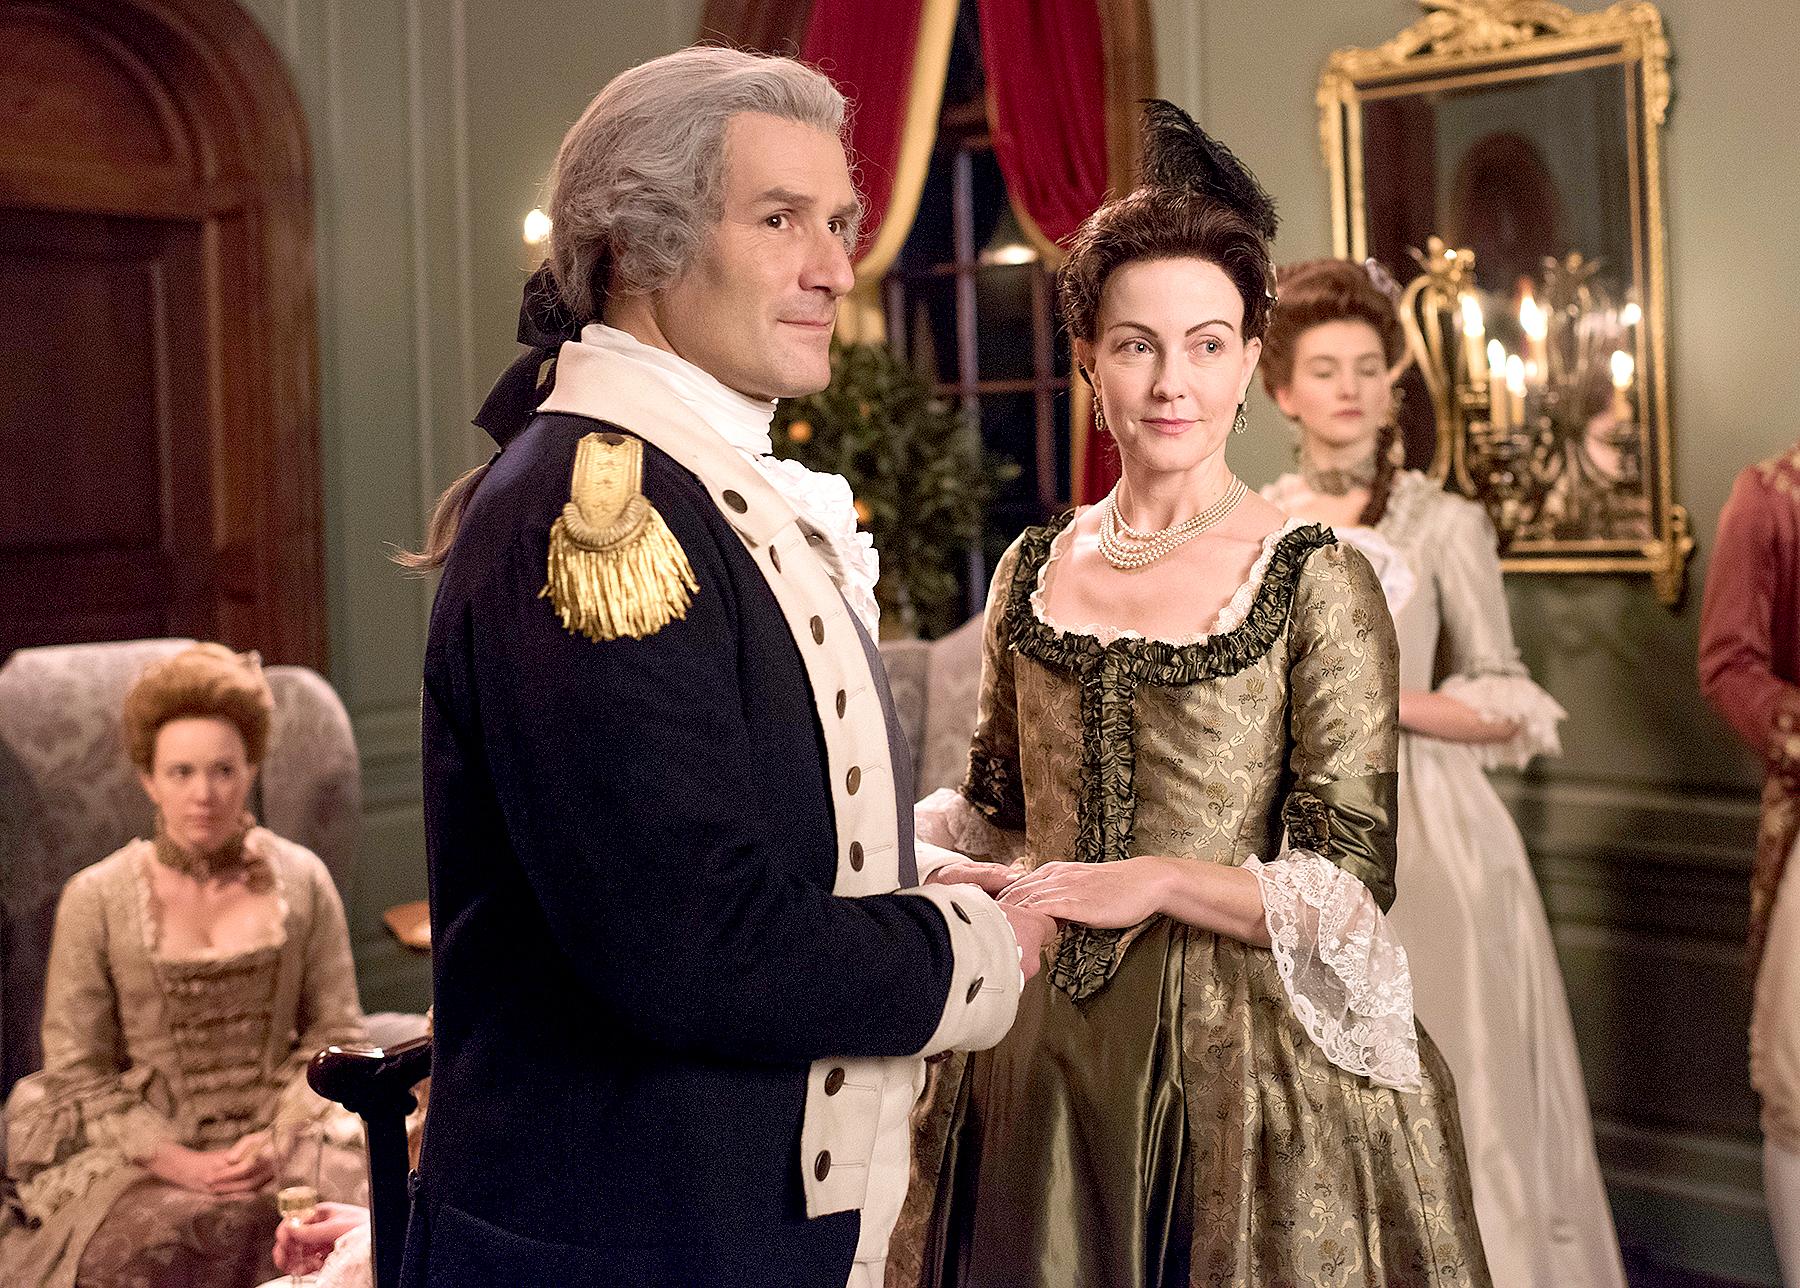 Ian Kahn as General George Washington on TURN: Washington's Spies